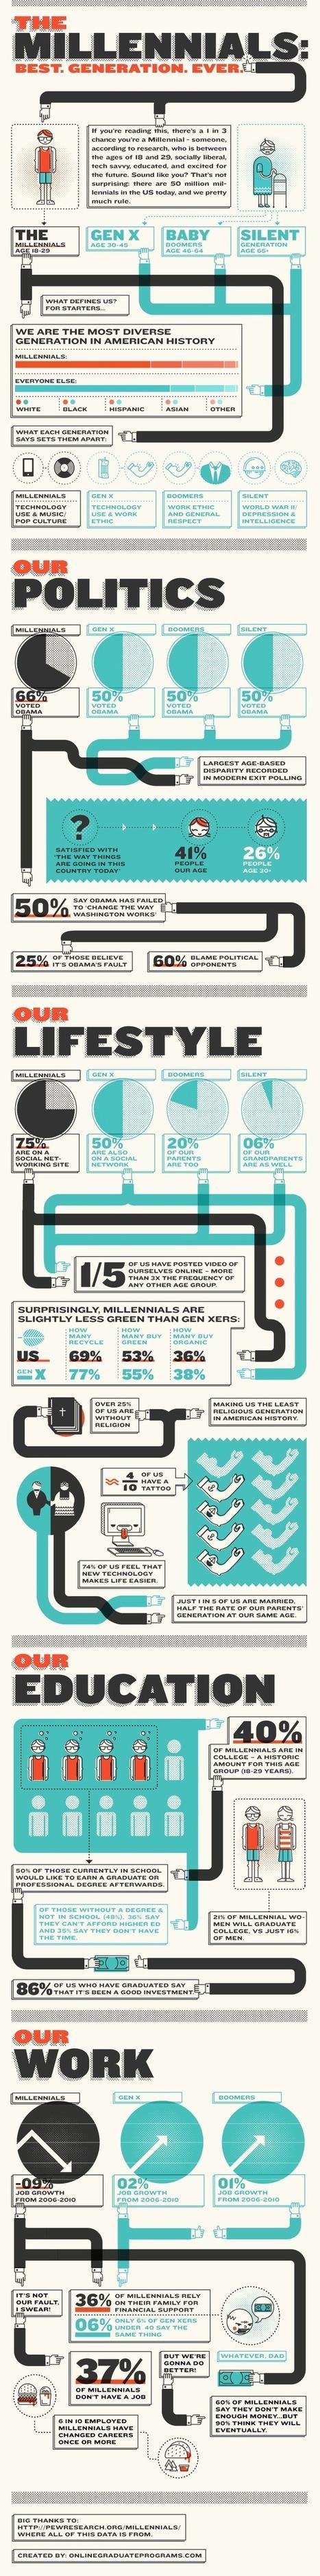 [Infographic] : Generation Y, best generation ever? | Psychology of Consumer Behaviour | Scoop.it